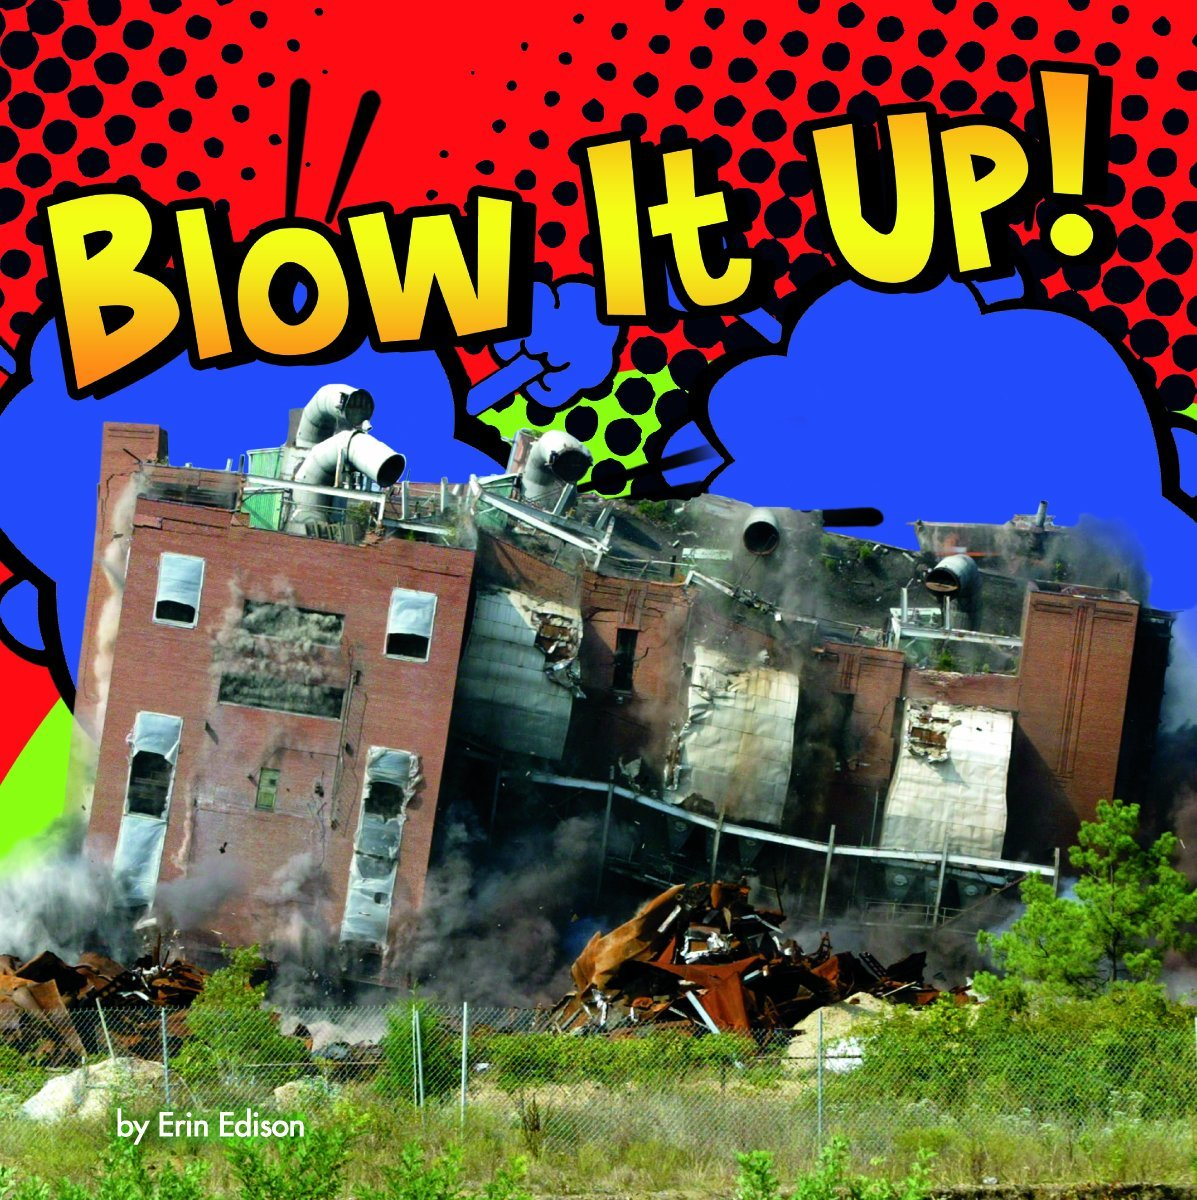 Blow It Up! (Destruction) Board book .  Erin Edison